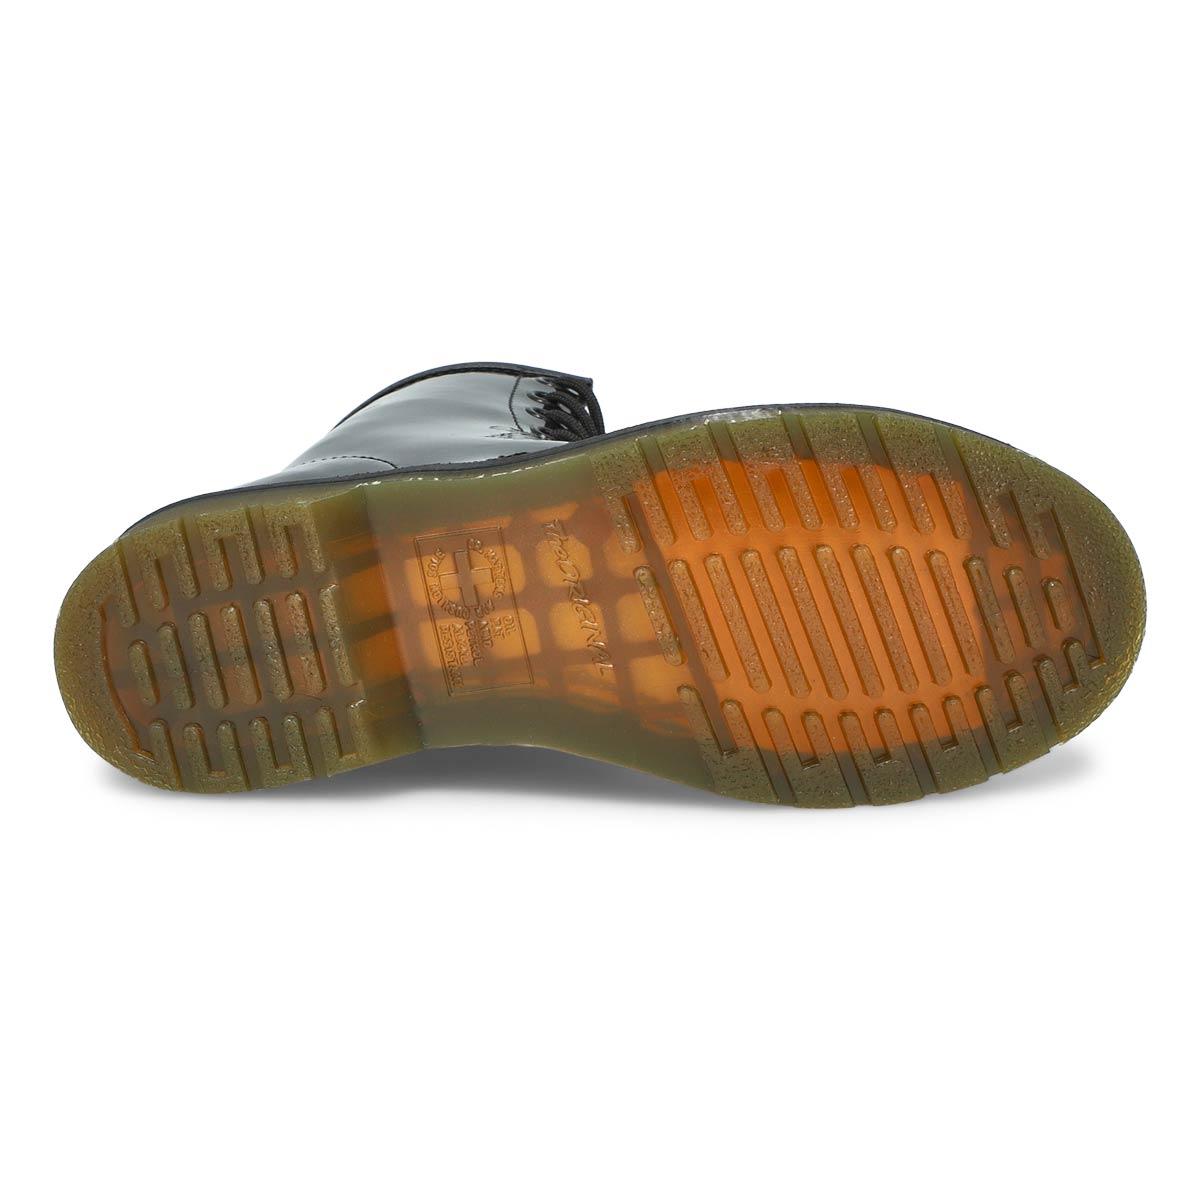 Lds 1460 8 eye black pat leather boot